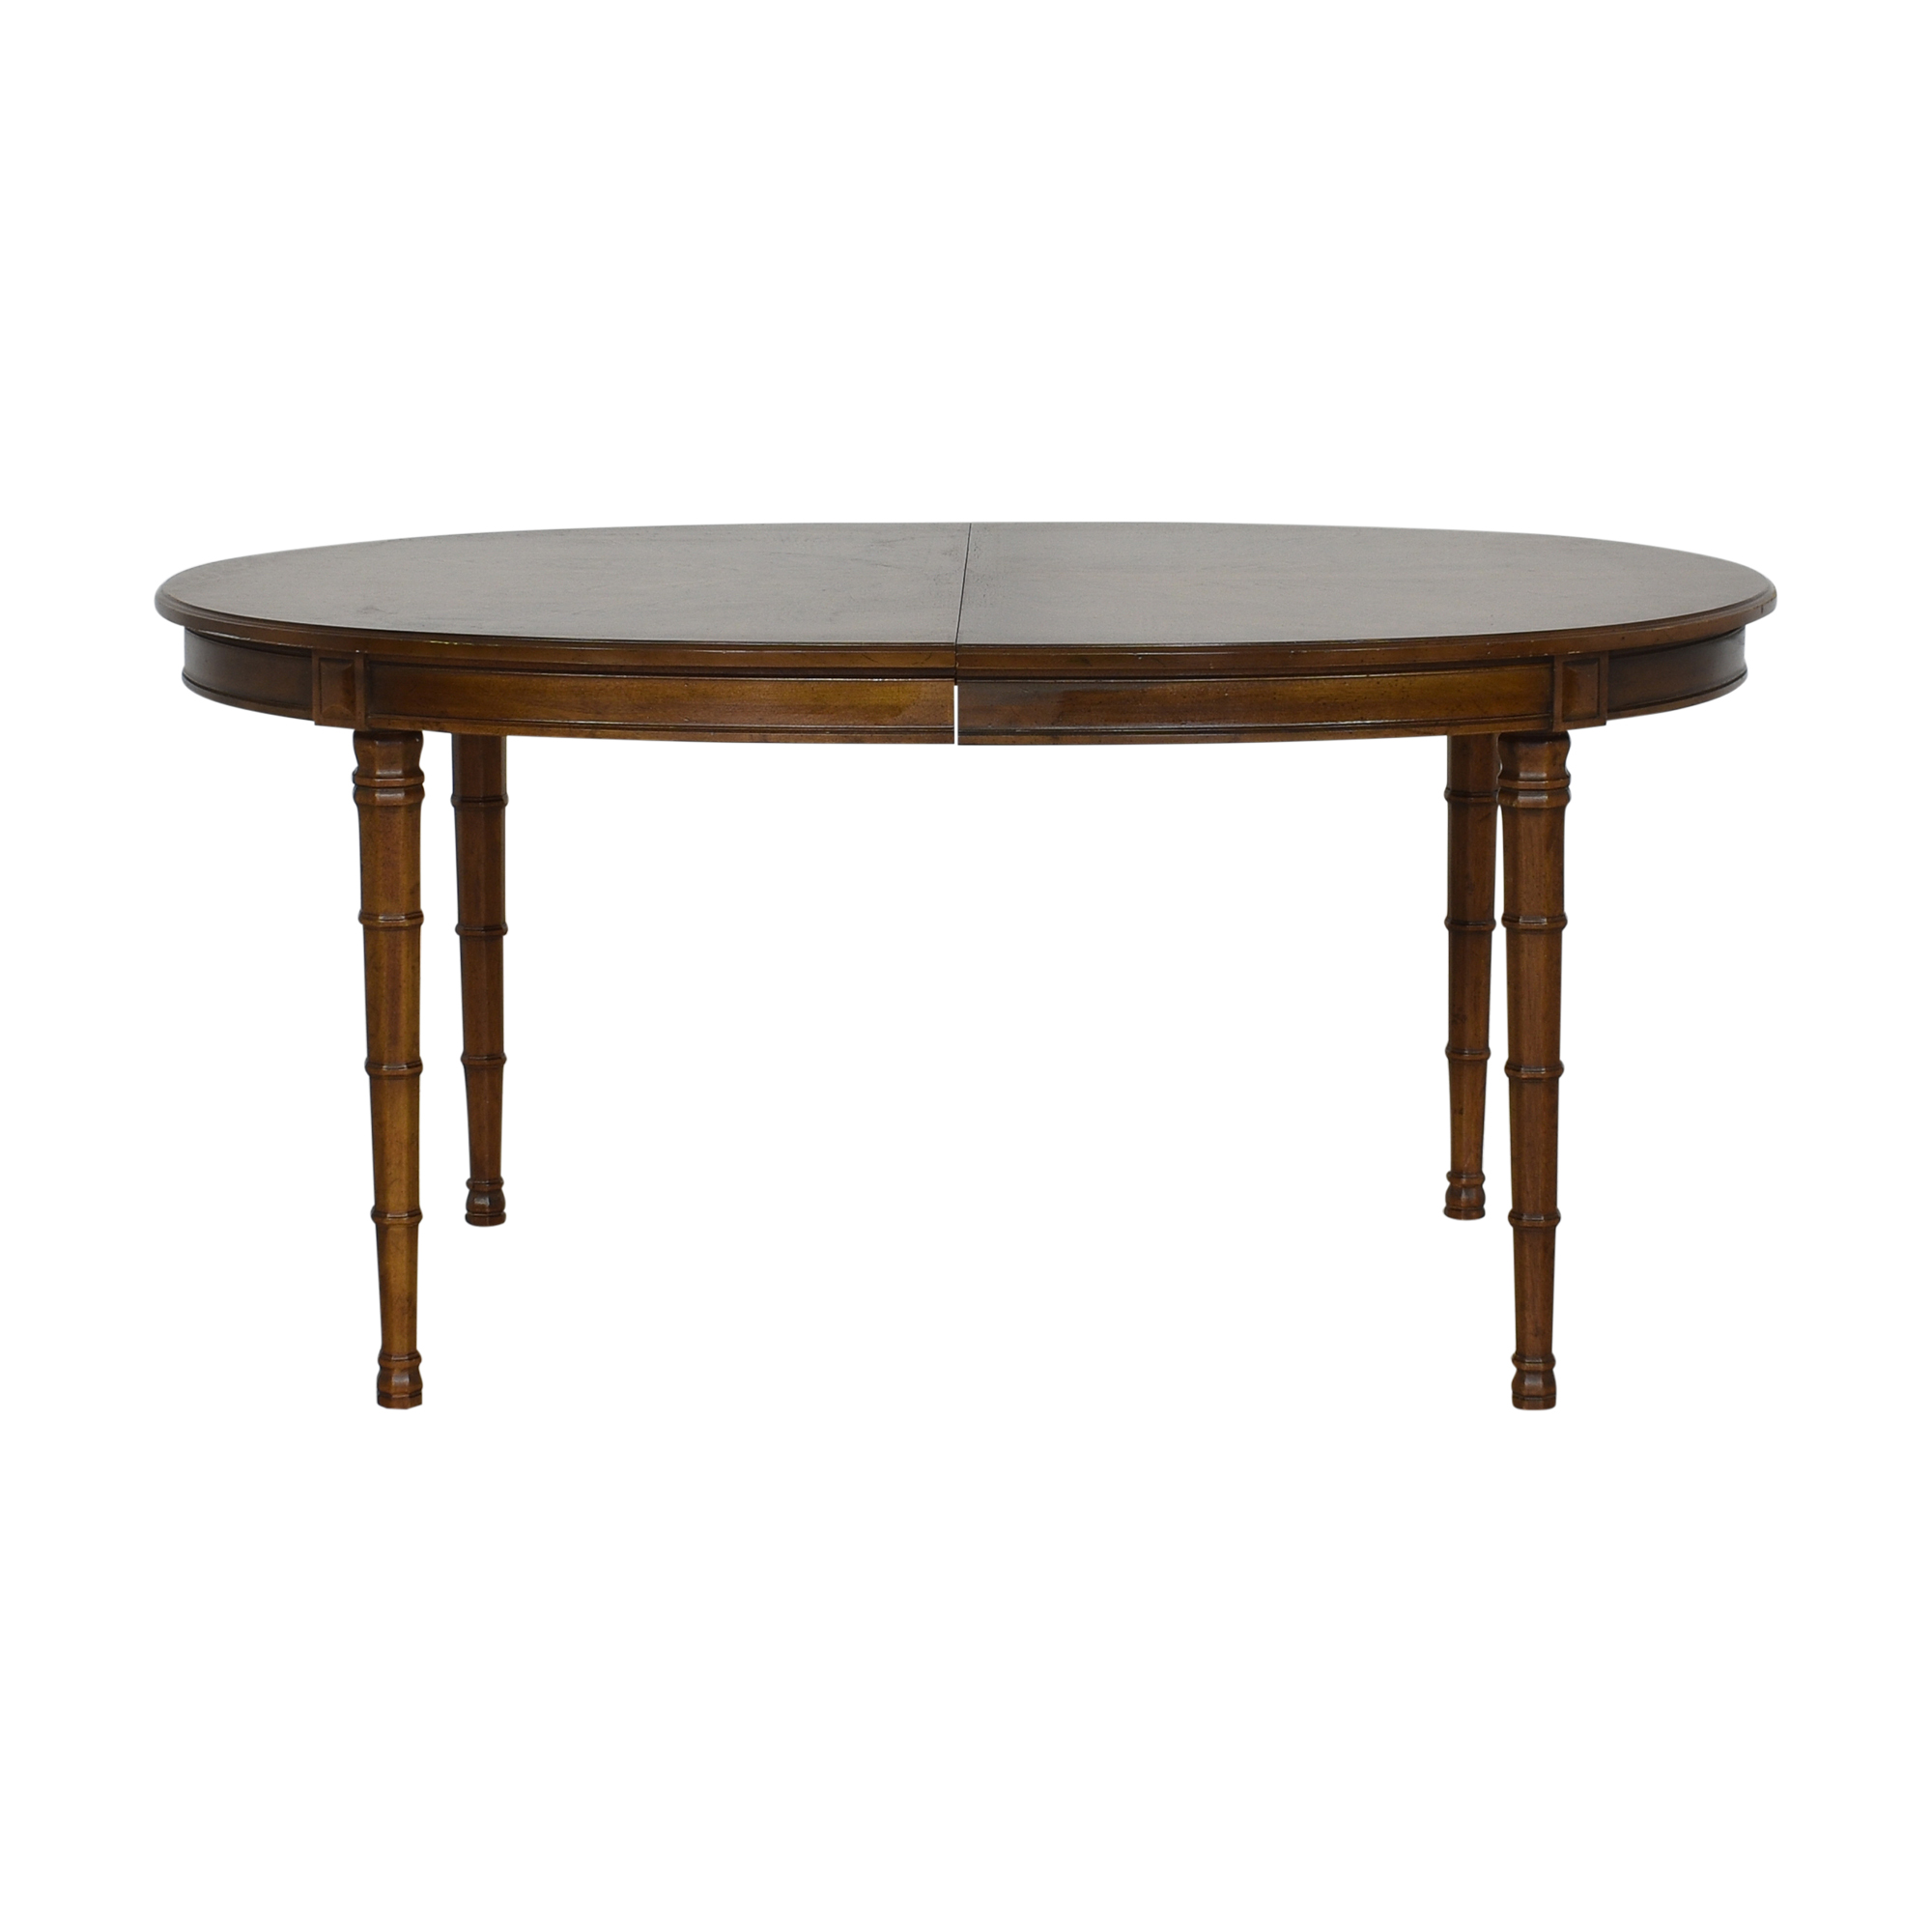 Henredon Oval Extendable Dining Table / Dinner Tables